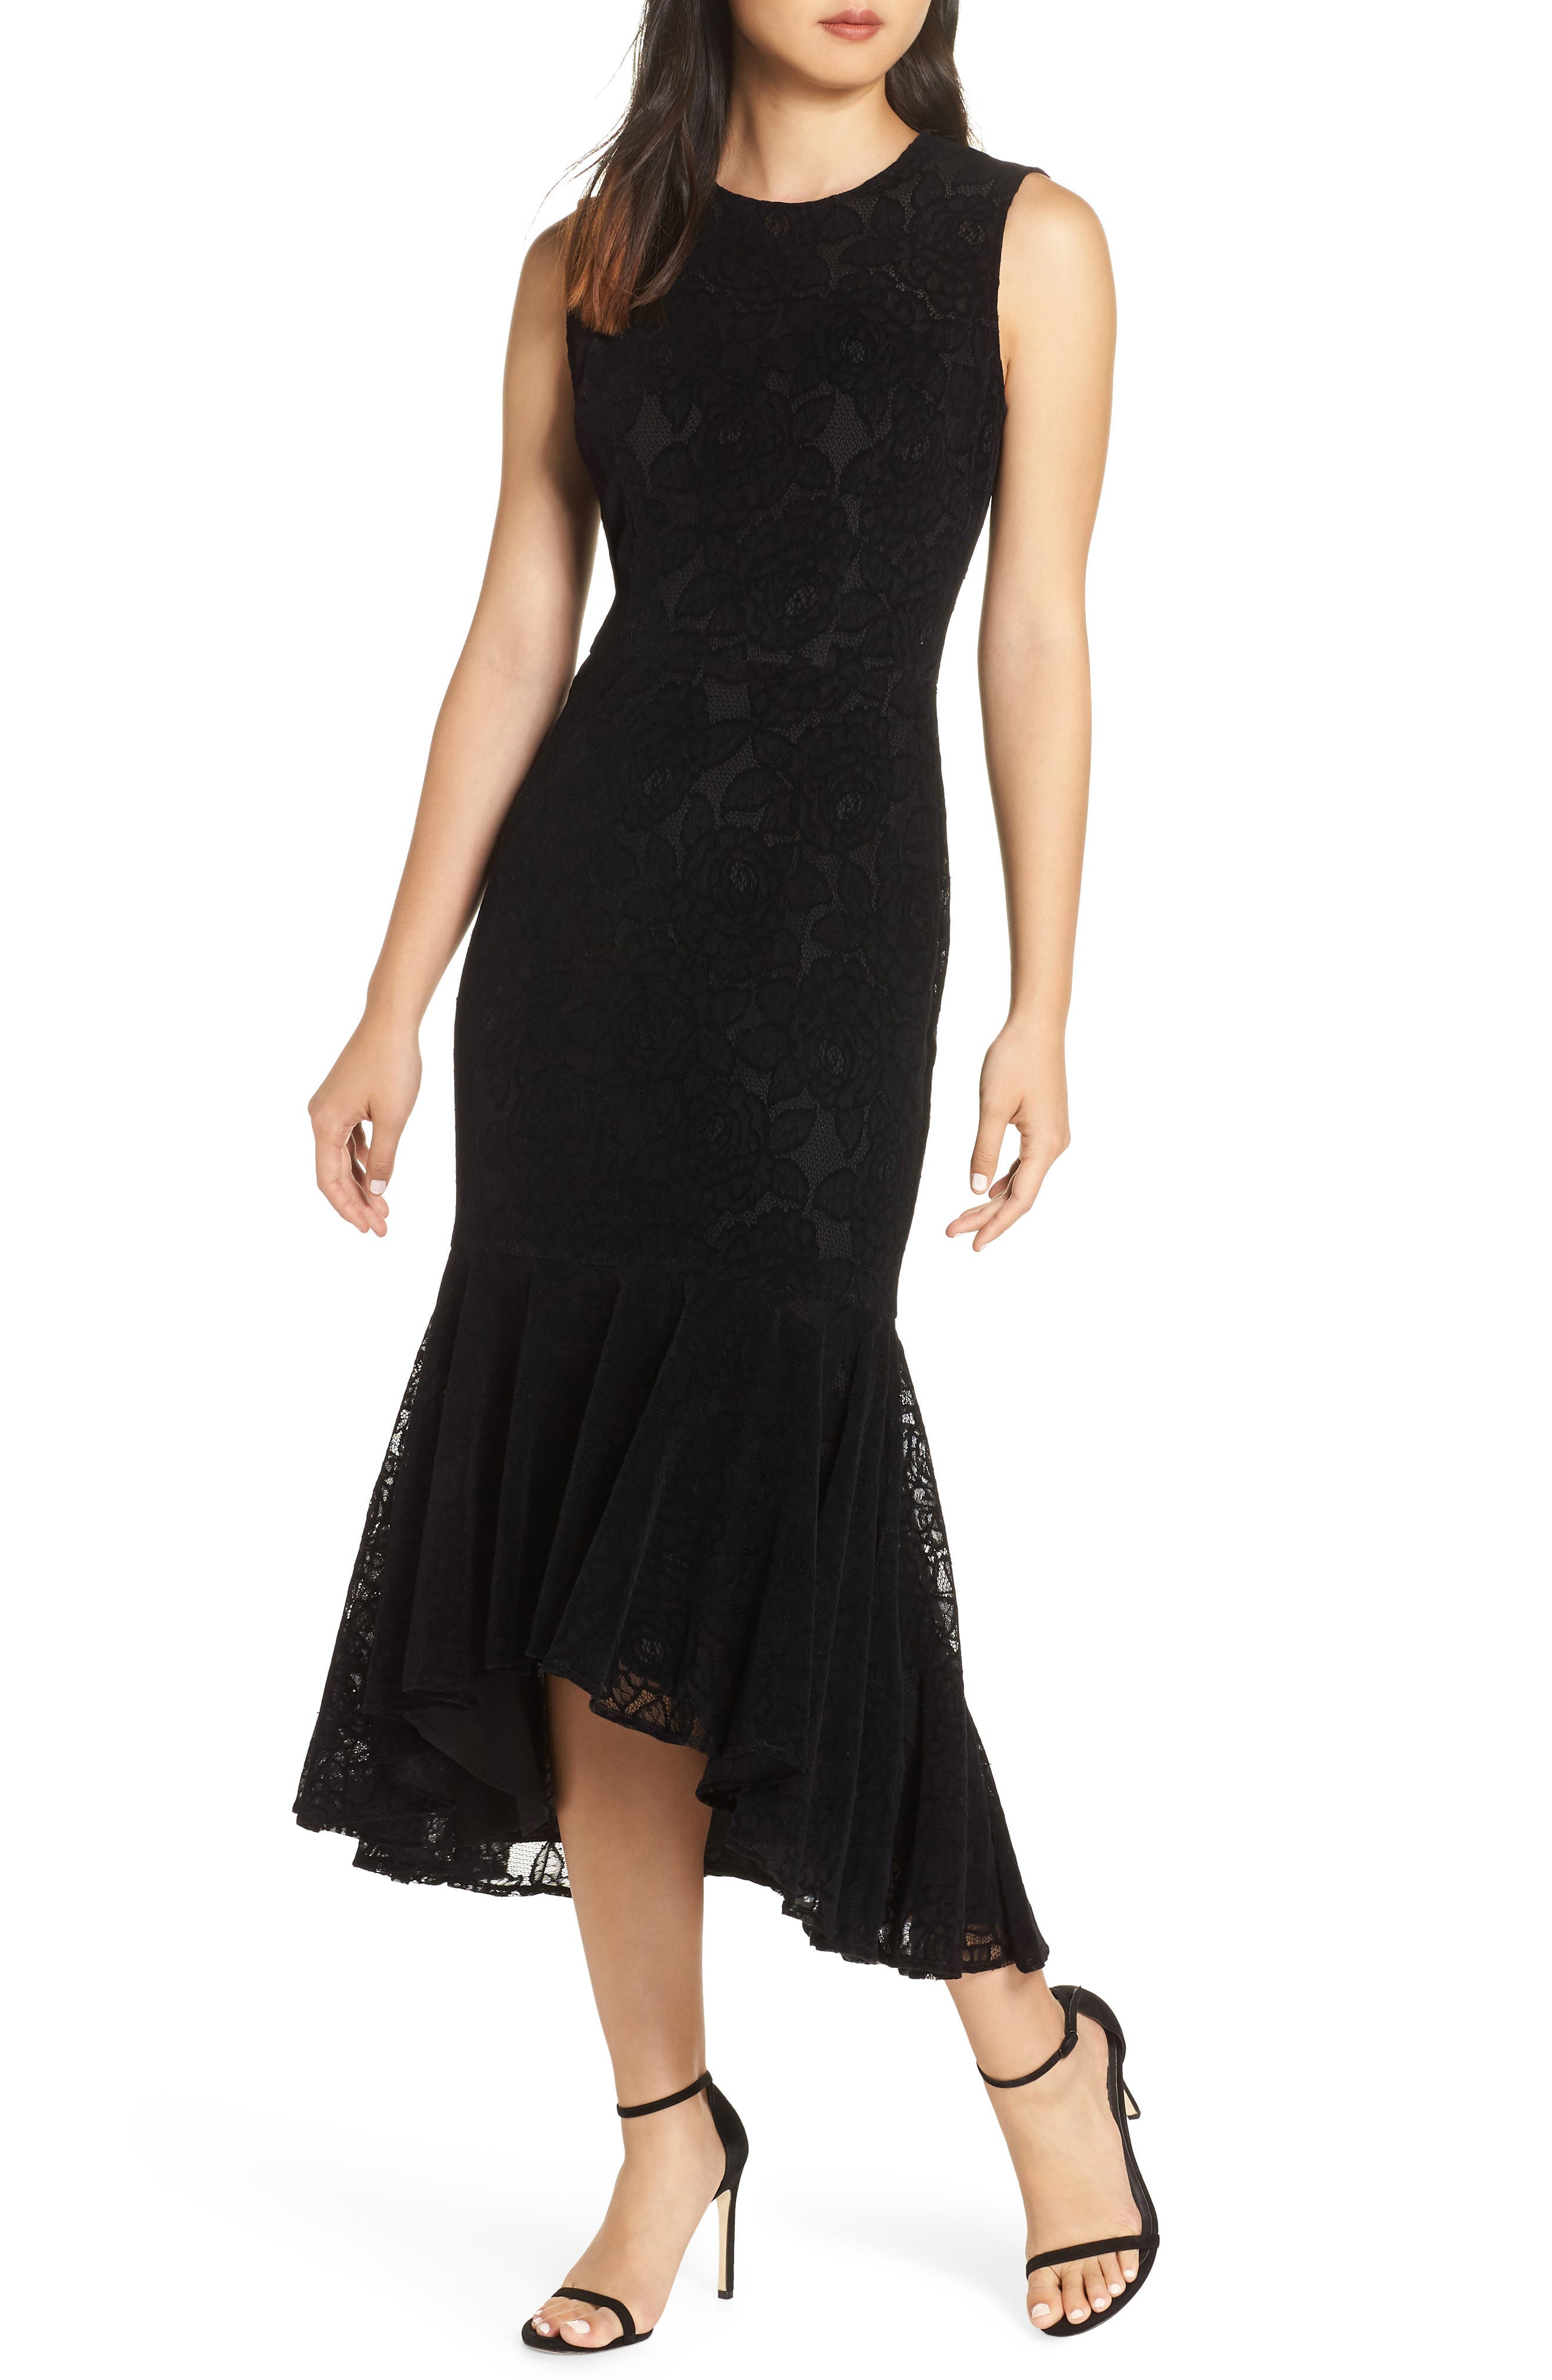 MAGGY LONDON Chantilly Velvet Lace Flounce Dress in Black